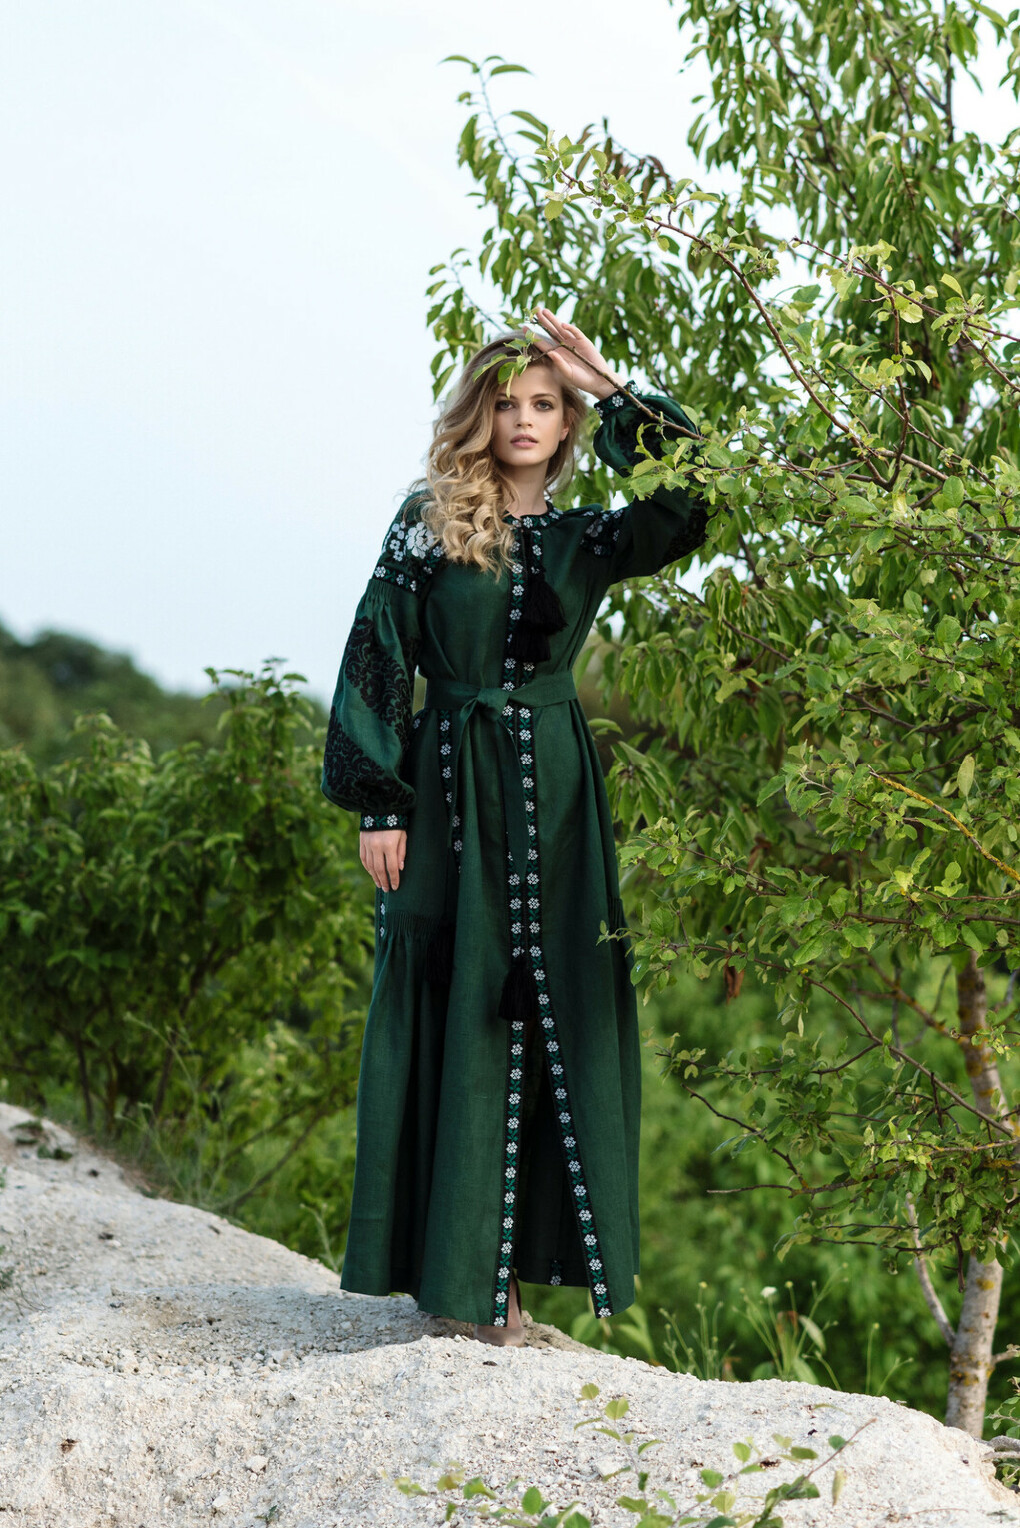 Довга сукня смарагдового кольору з рослинним орнаментом